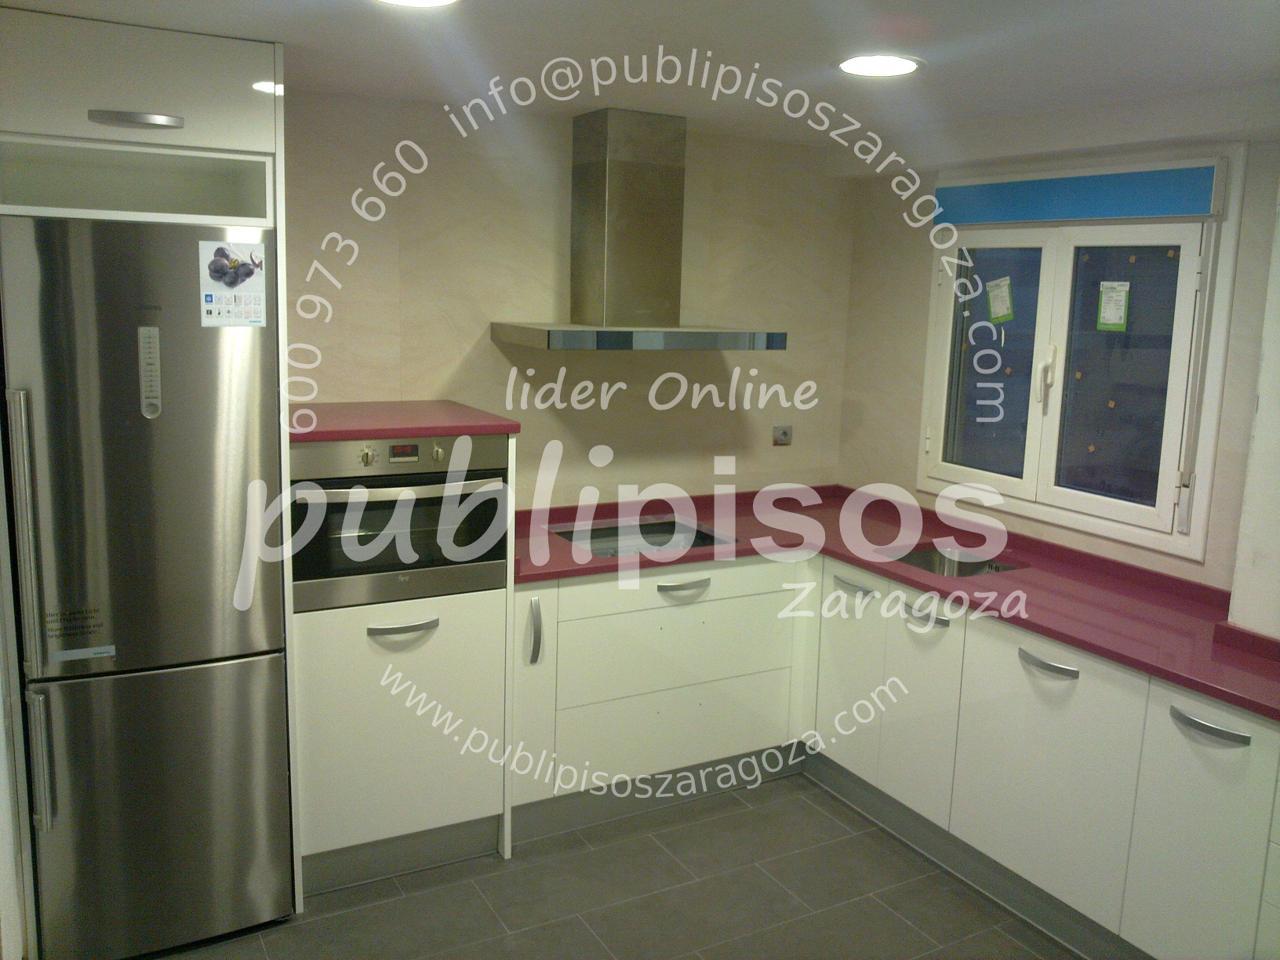 Venta Atico Duplex Obra Nueva Centro Casco Histórico Zaragoza|PUBLIPISOS Inmobiliarias-32